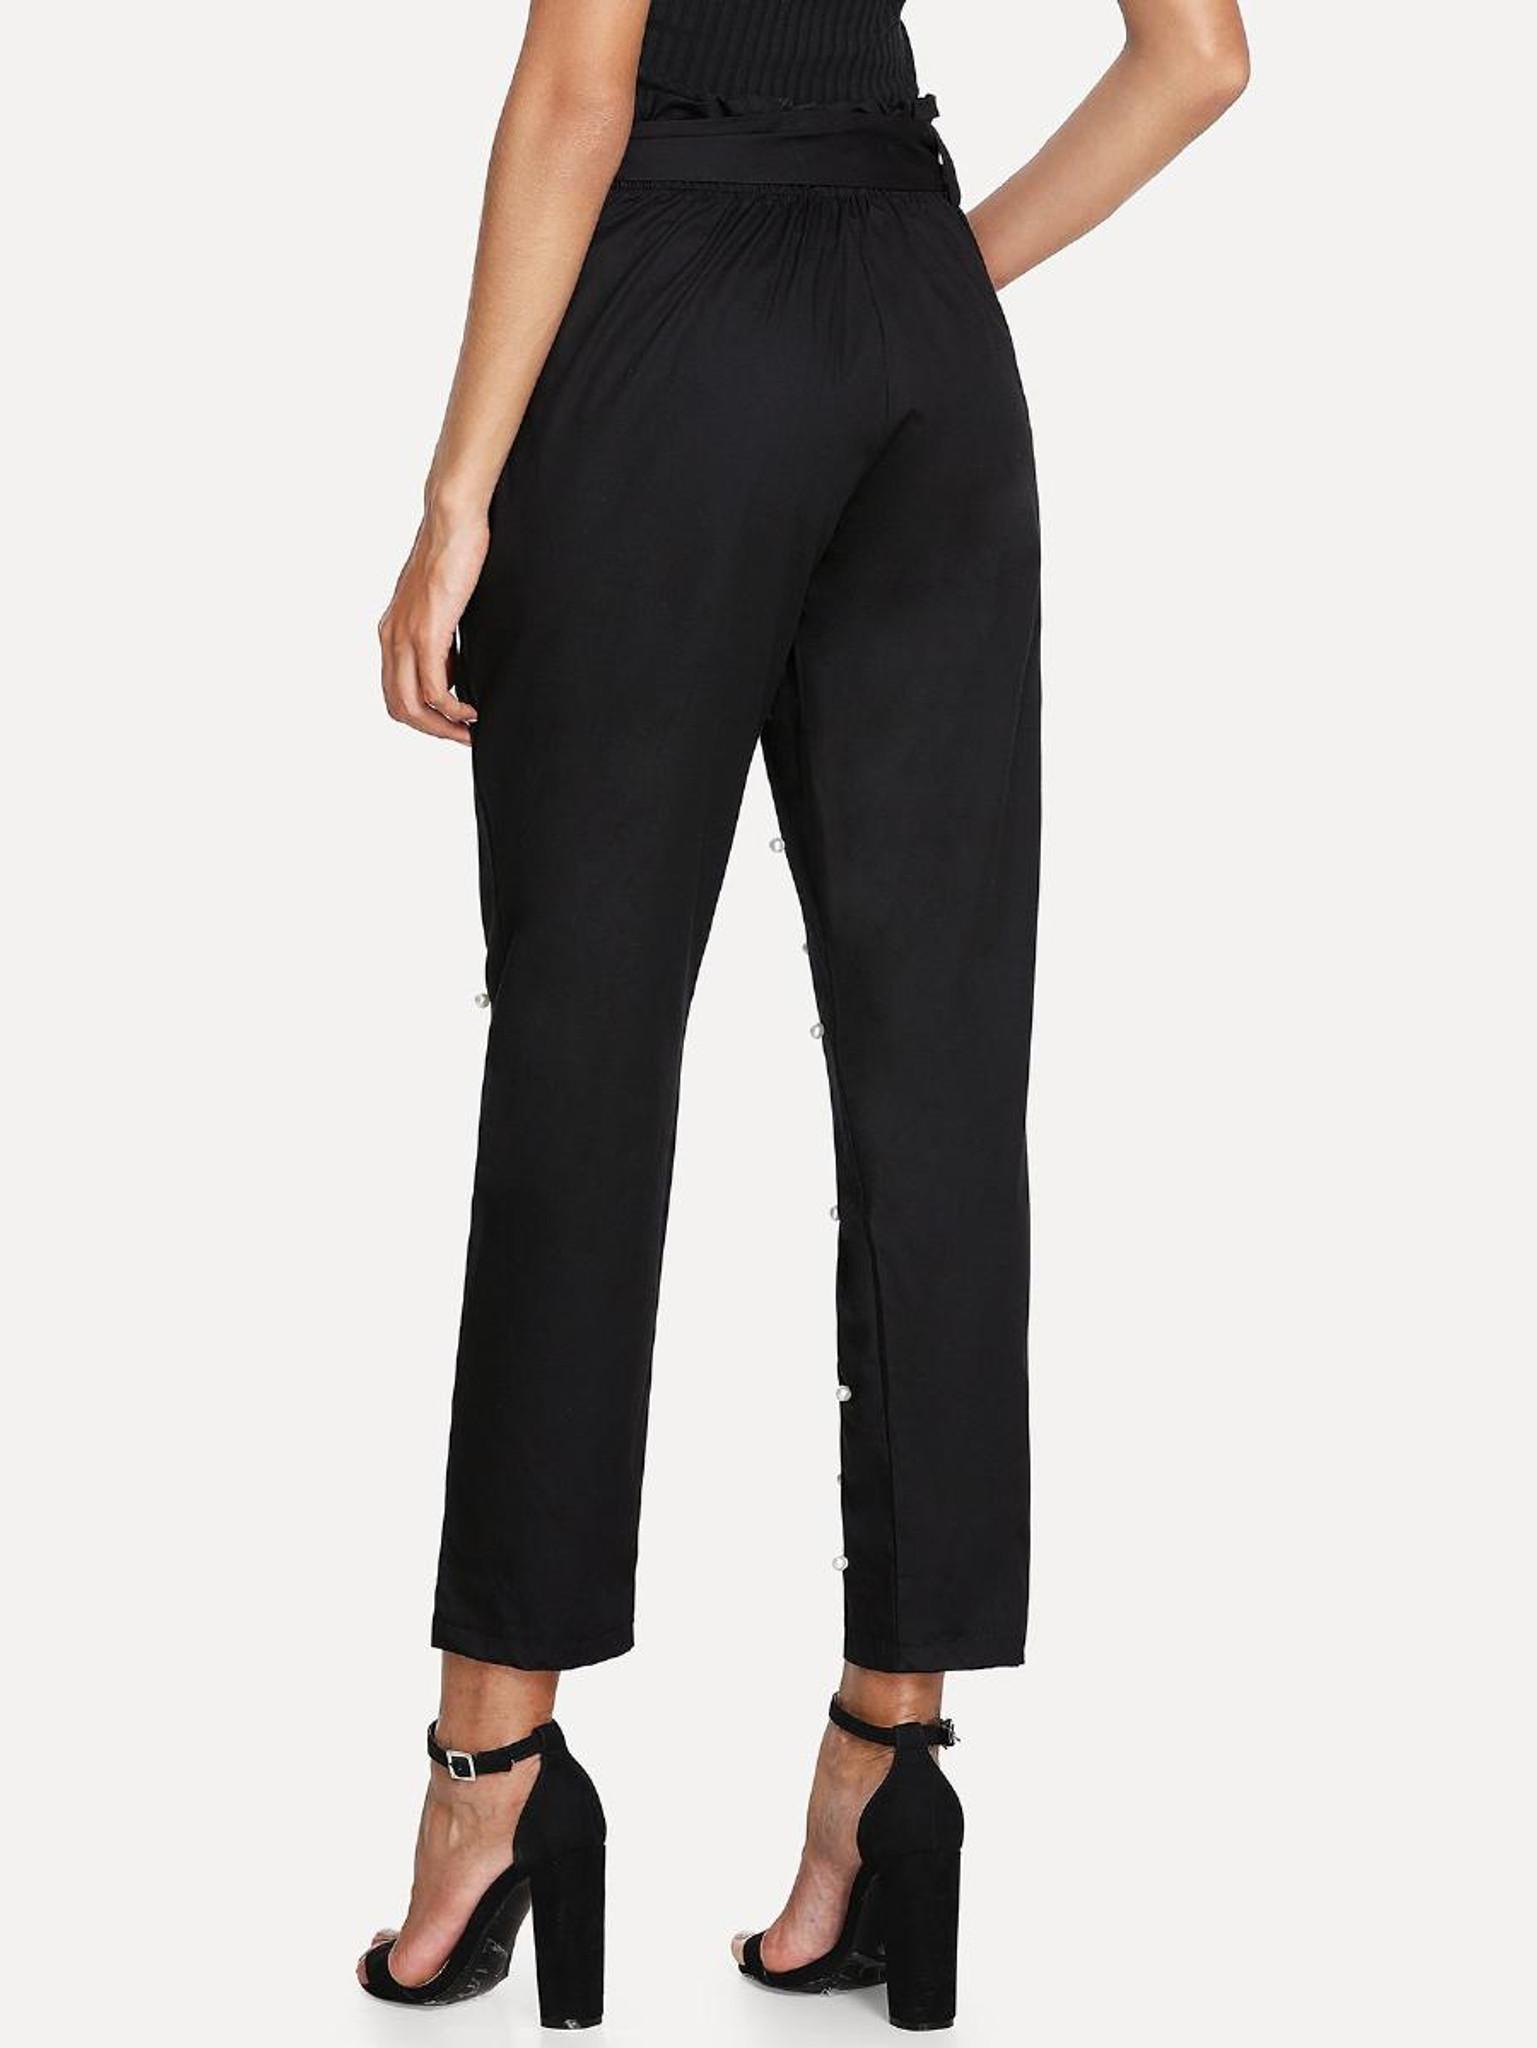 Fifth Avenue Women's GVII  Beaded Self Tie Waist Waist Pants - Black